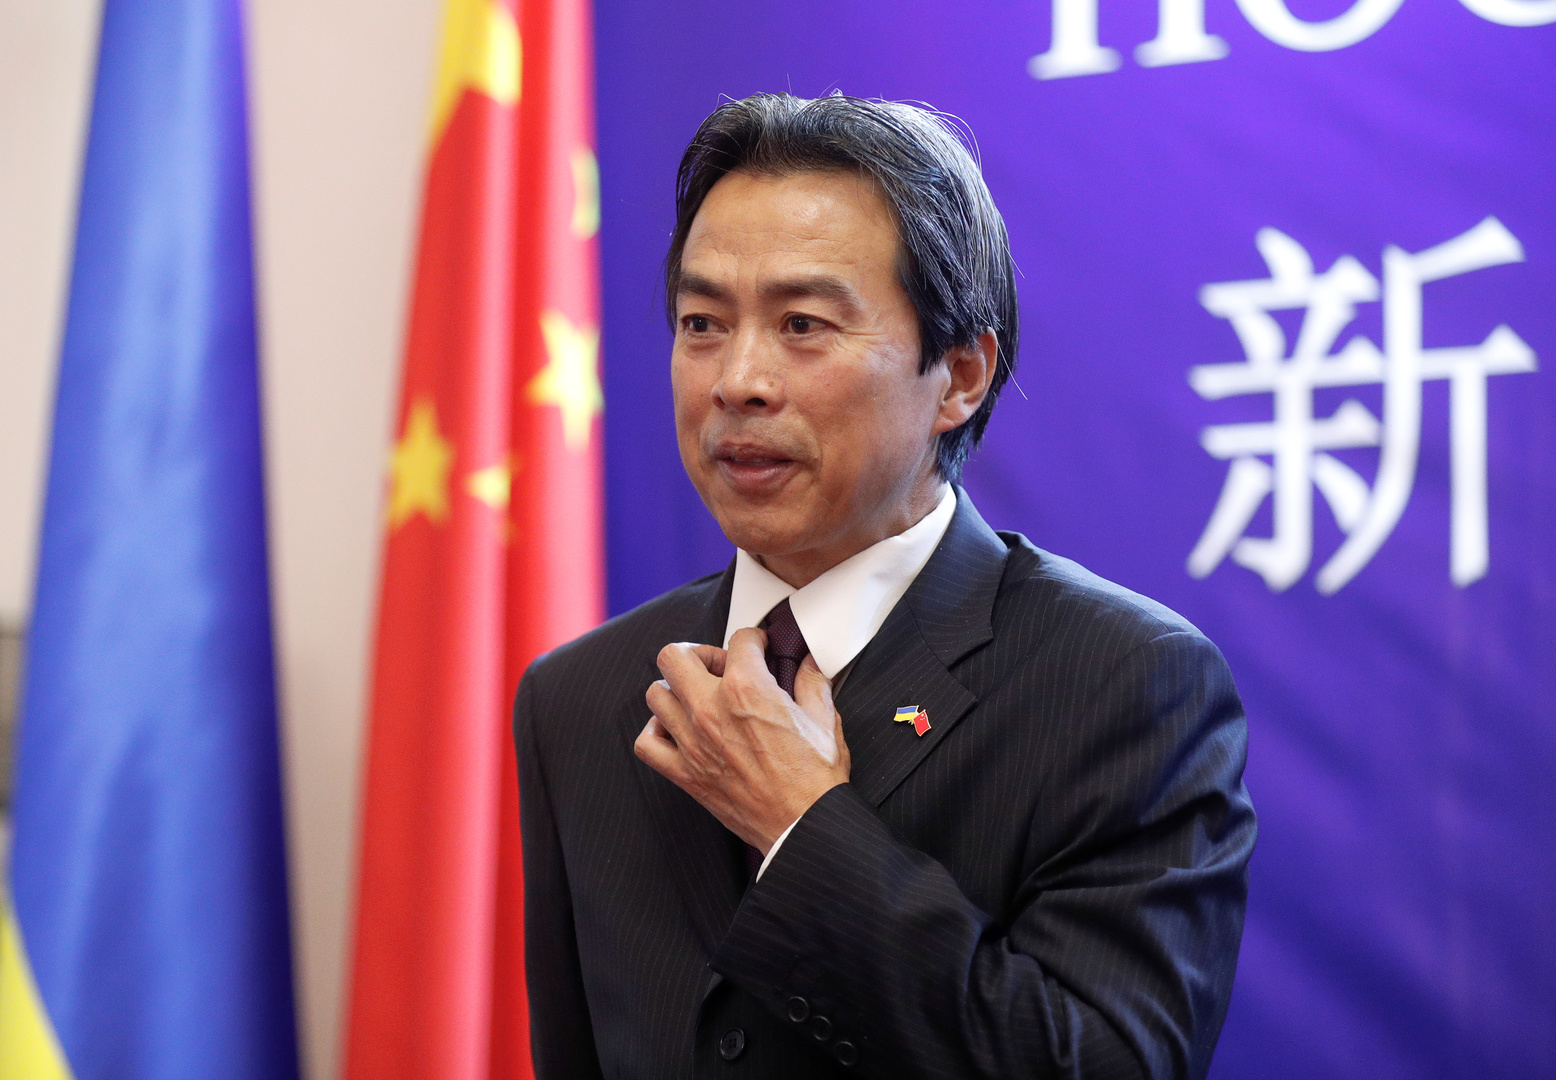 Chinas Botschafter in Israel tot aufgefunden